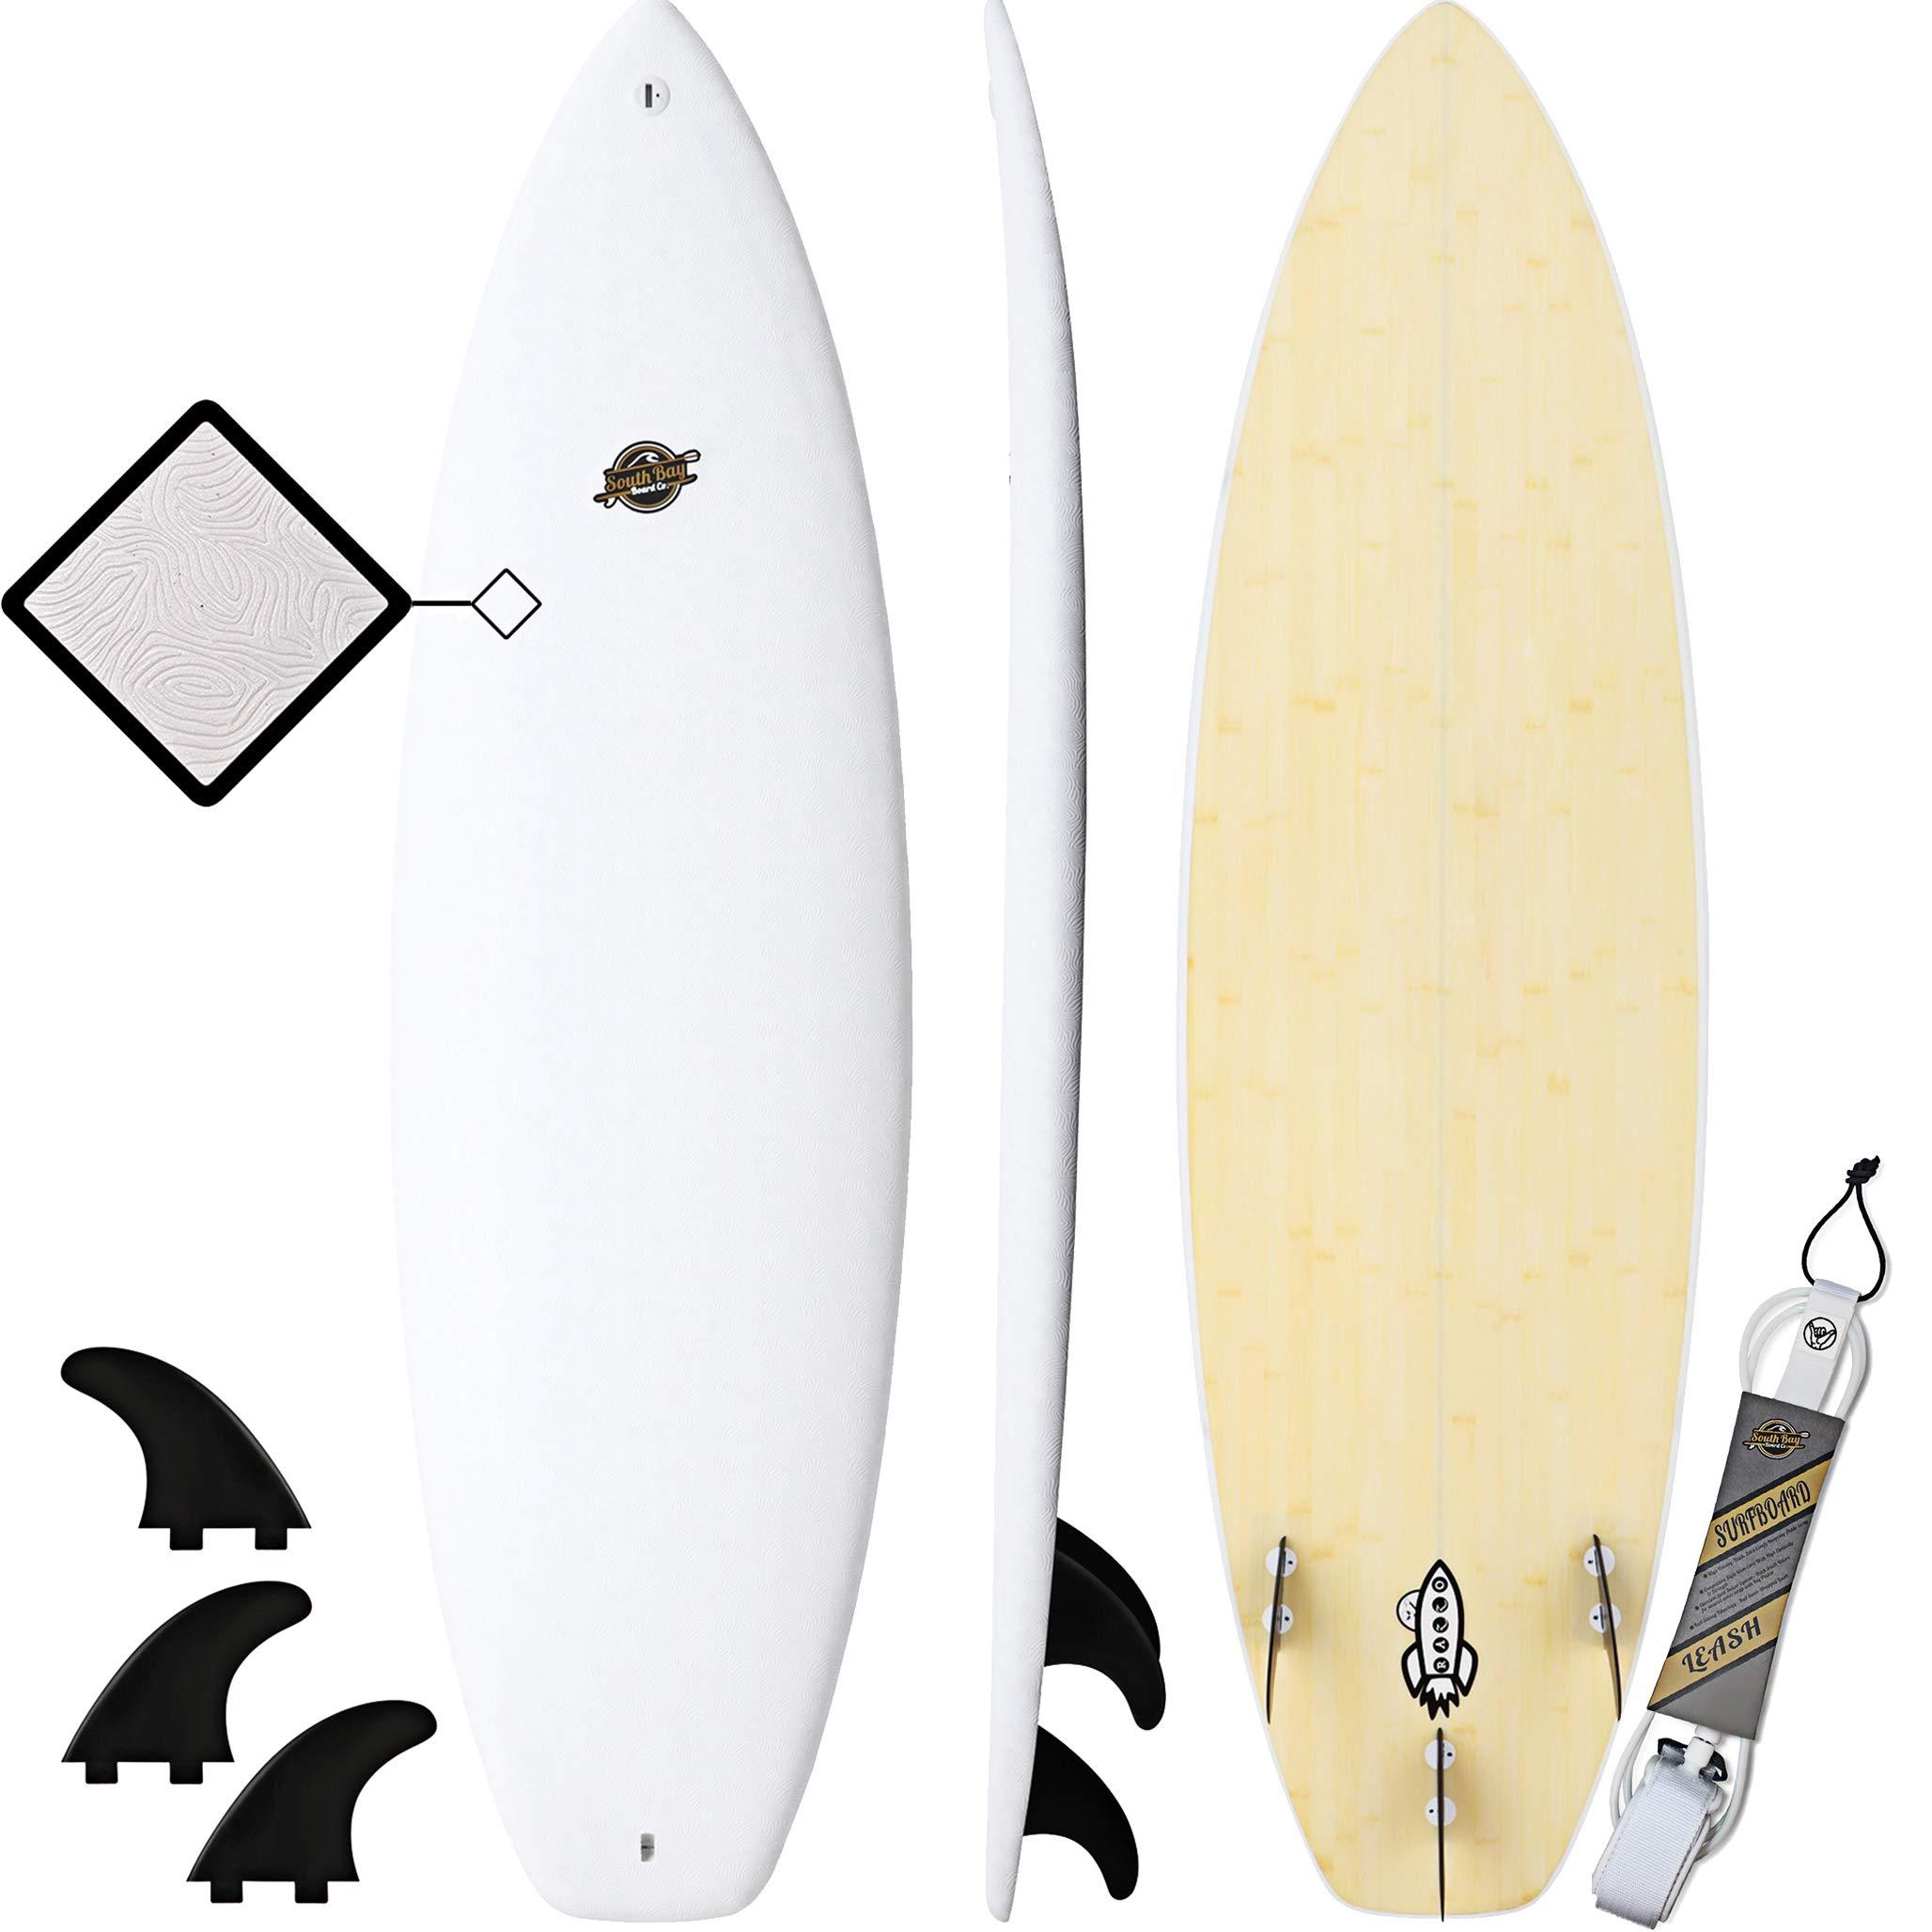 Hybrid Surfboard - Best Performance Foam Surfboard for All Levels of Surfing - Custom Longboard & Shortboard Surfboard Shapes for Kids and Adults - Wax Free Soft Top + Fiberglassed Hard Bottom by South Bay Board Co.